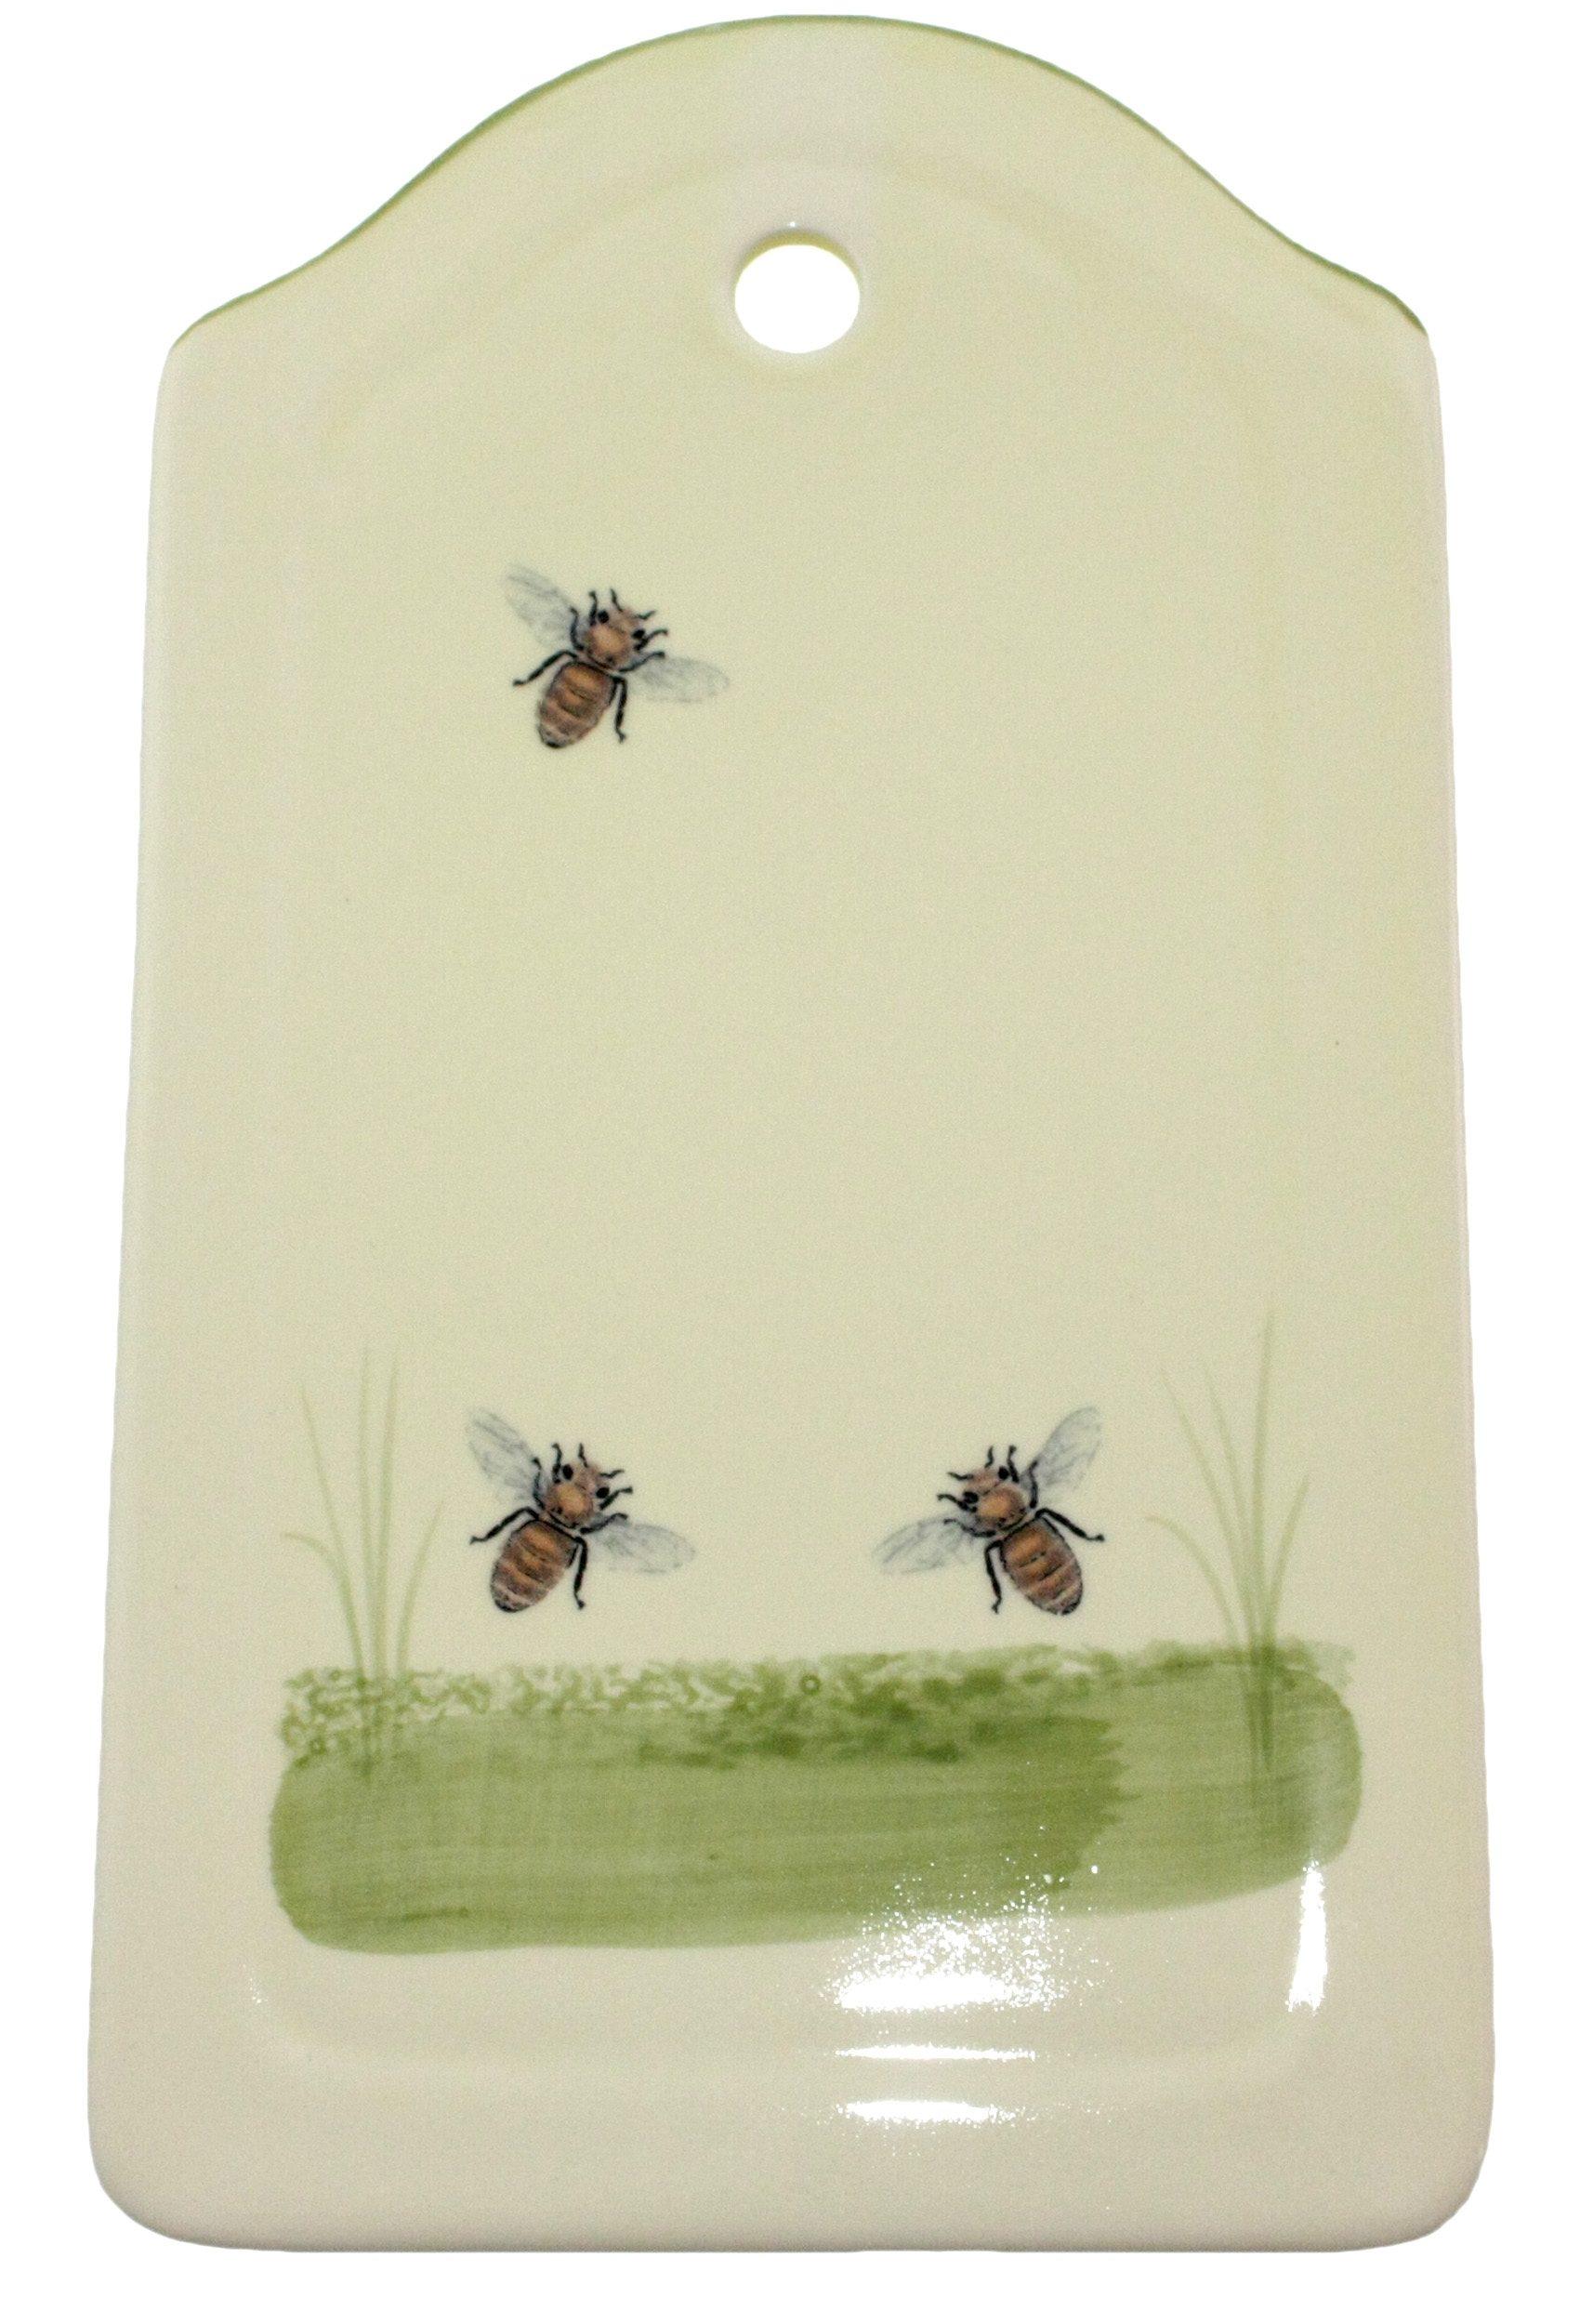 Zeller Keramik Brotplatte »Biene«